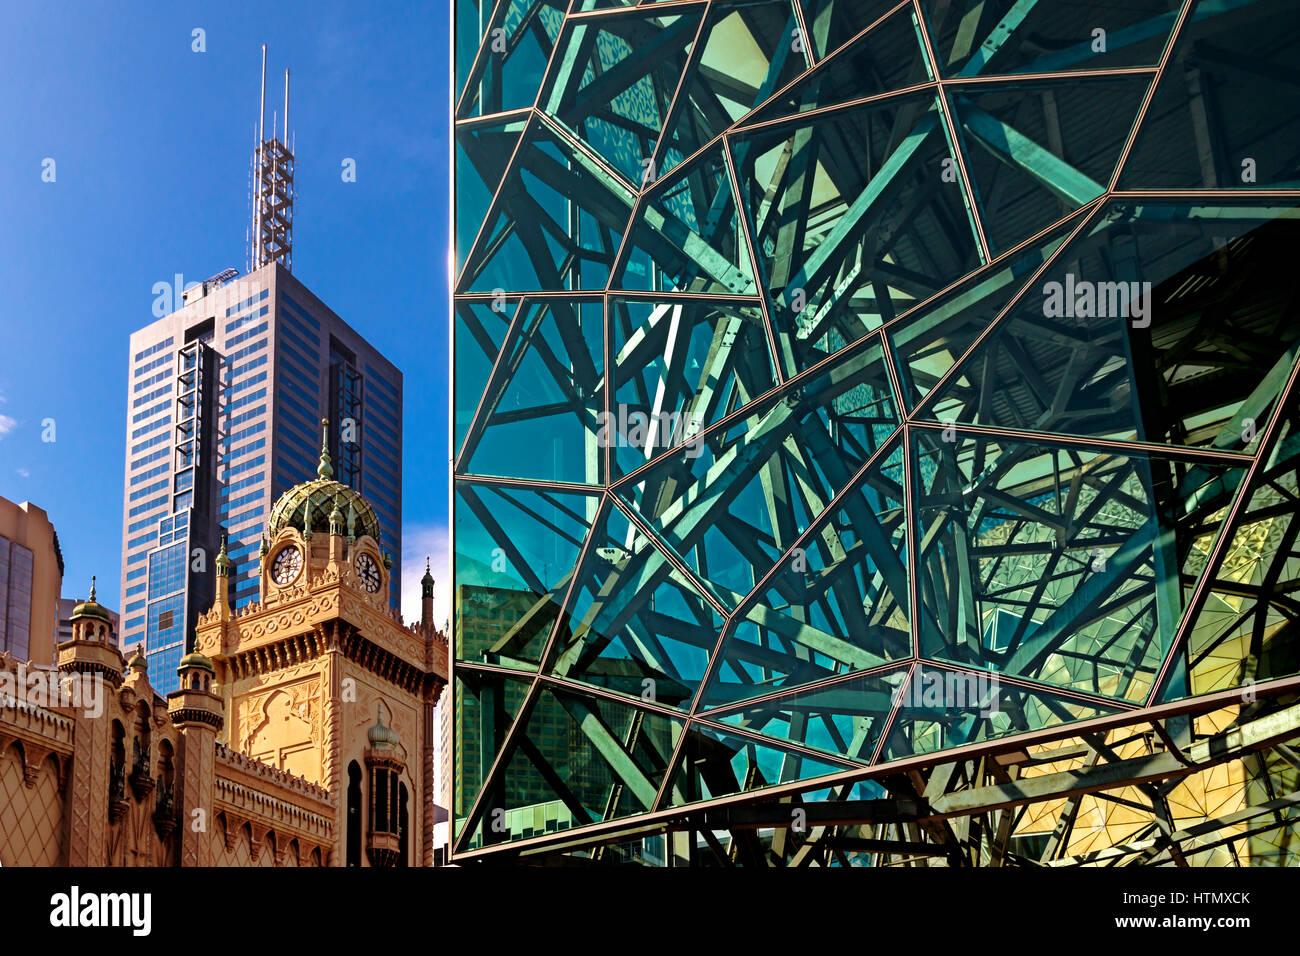 Modern architecture at Federation Square, Melbourne, Australia - Stock Image